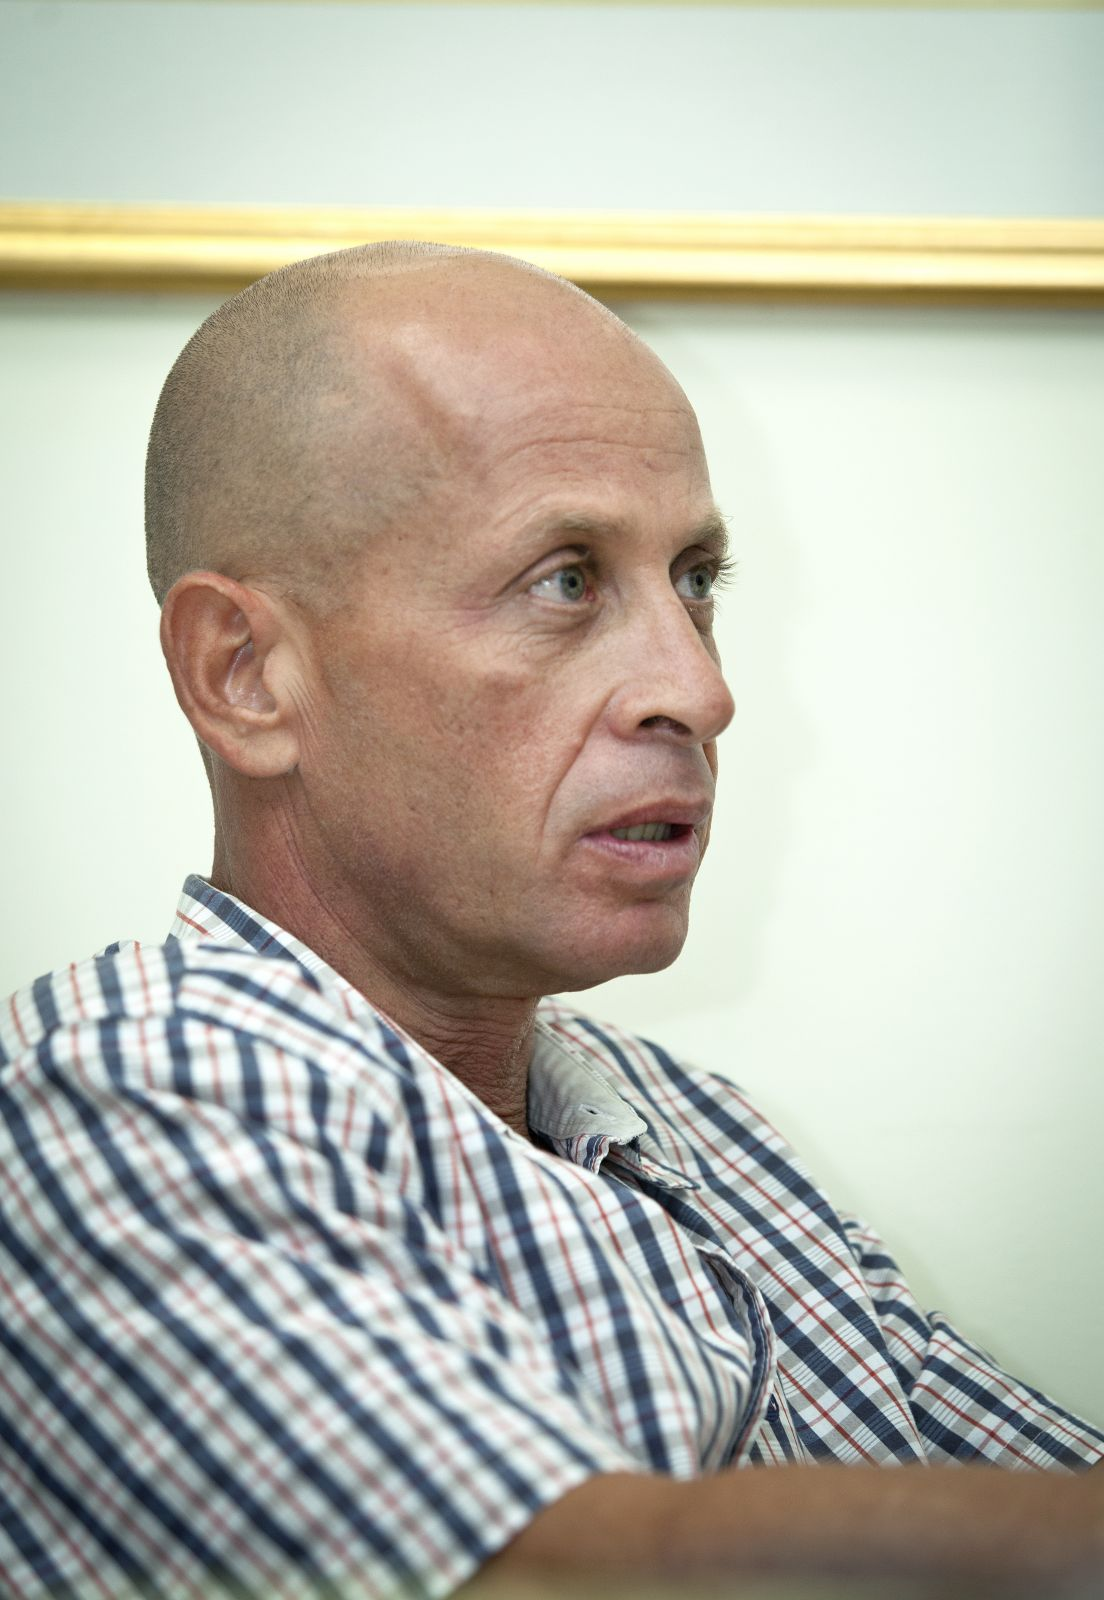 איציק סבן (צילום: משה שי)